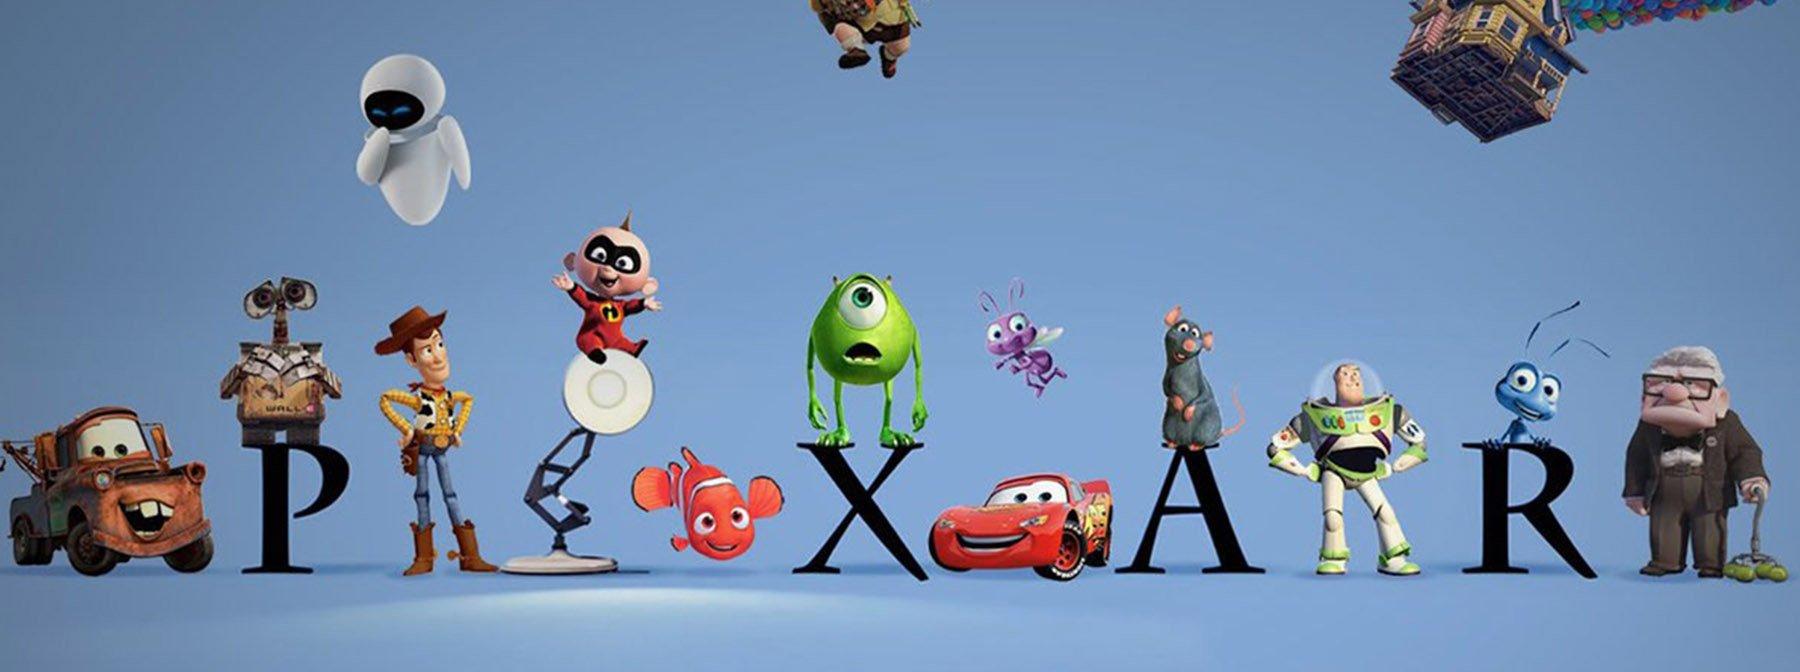 Pixar tendrá película inspirada en la Rivera Italiana